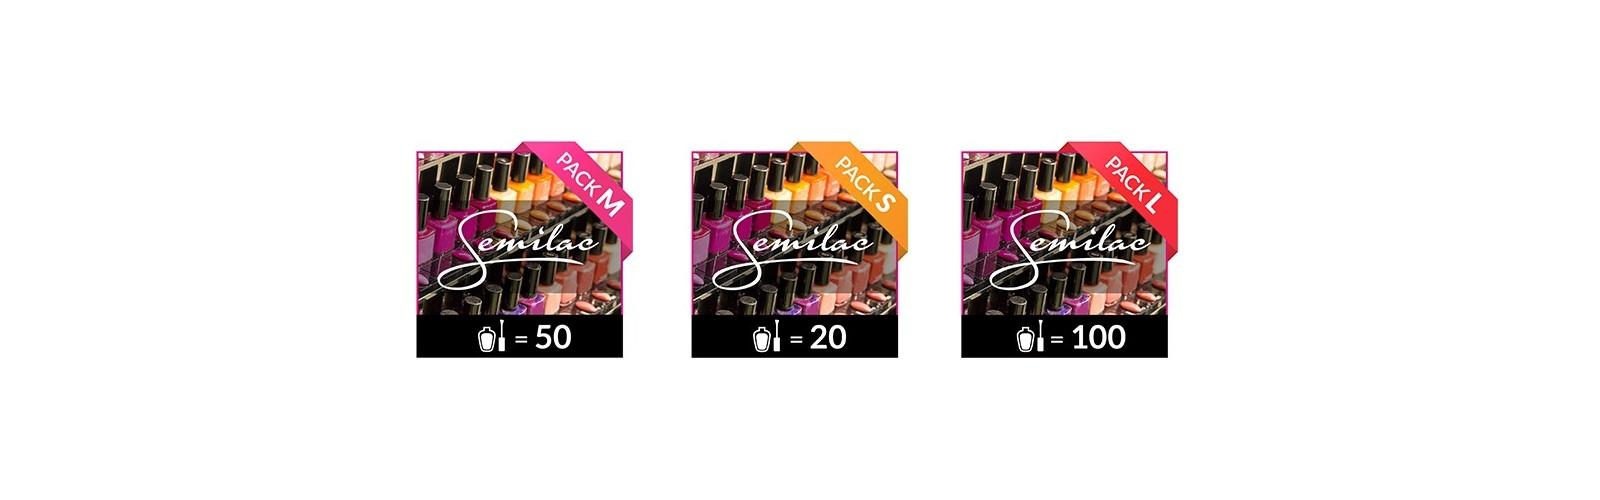 Packs Semilac